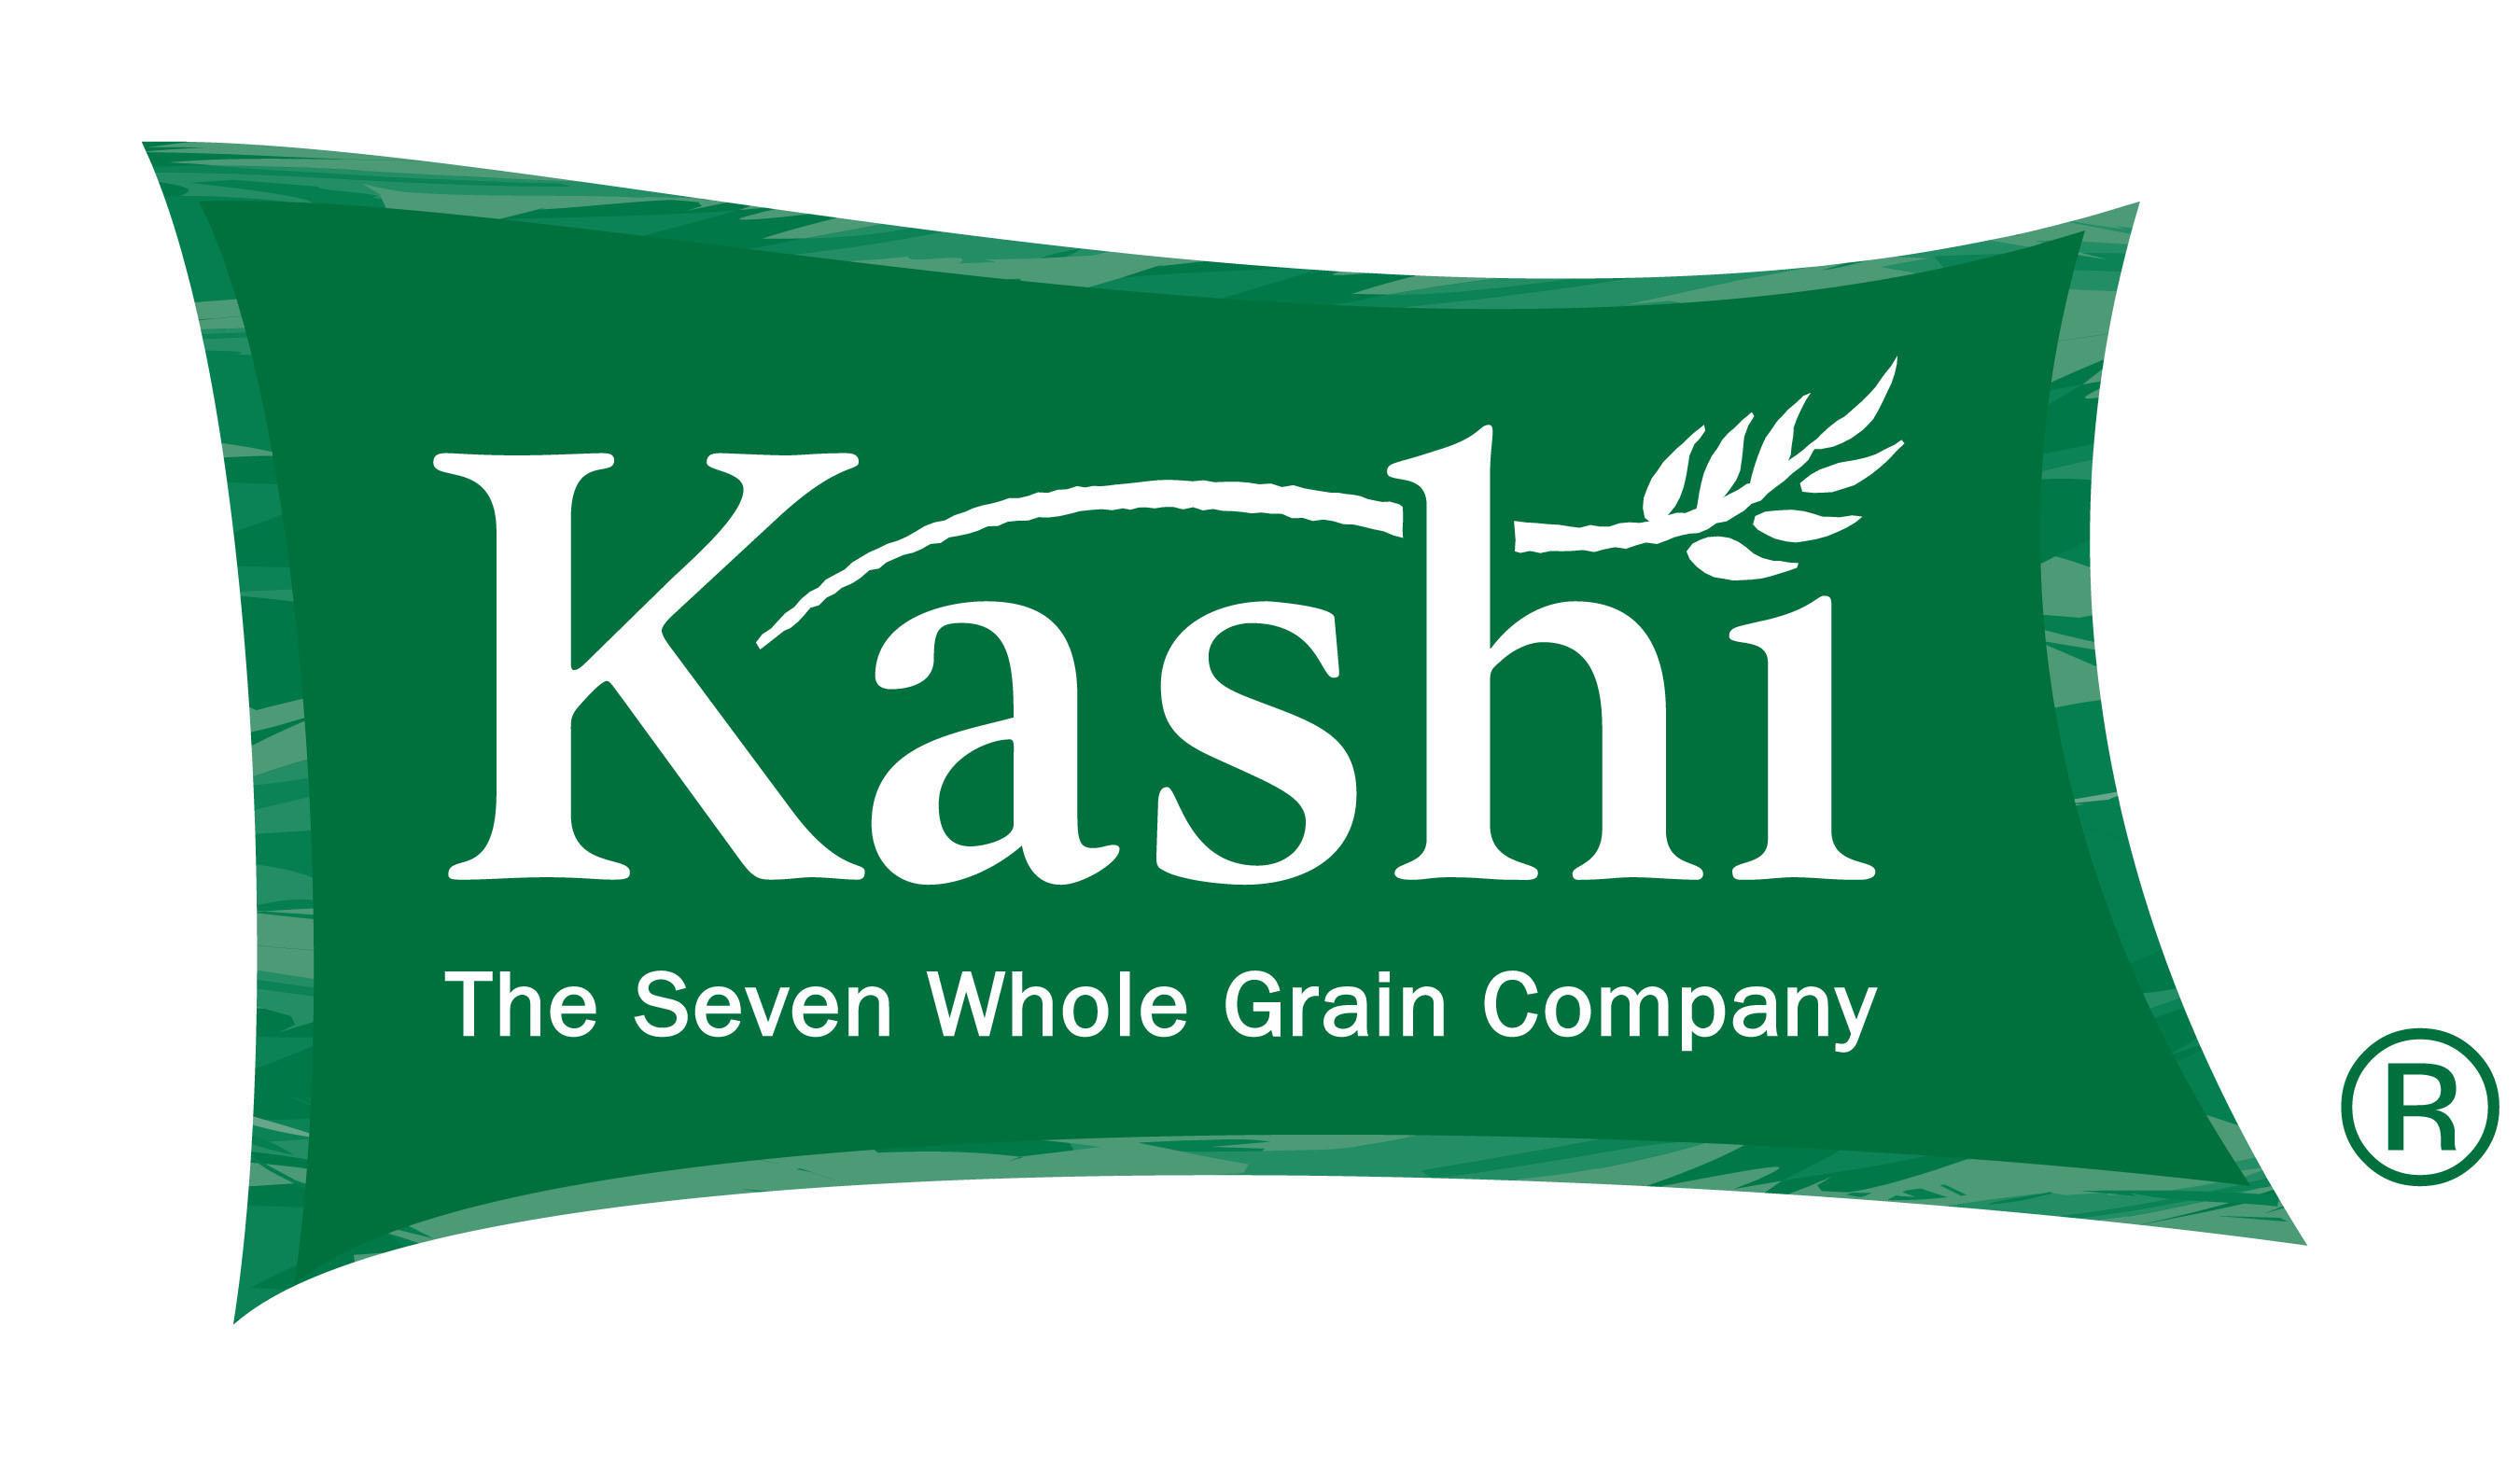 Kashi Cereal Logo KASHI COMPANY LOGO | T...